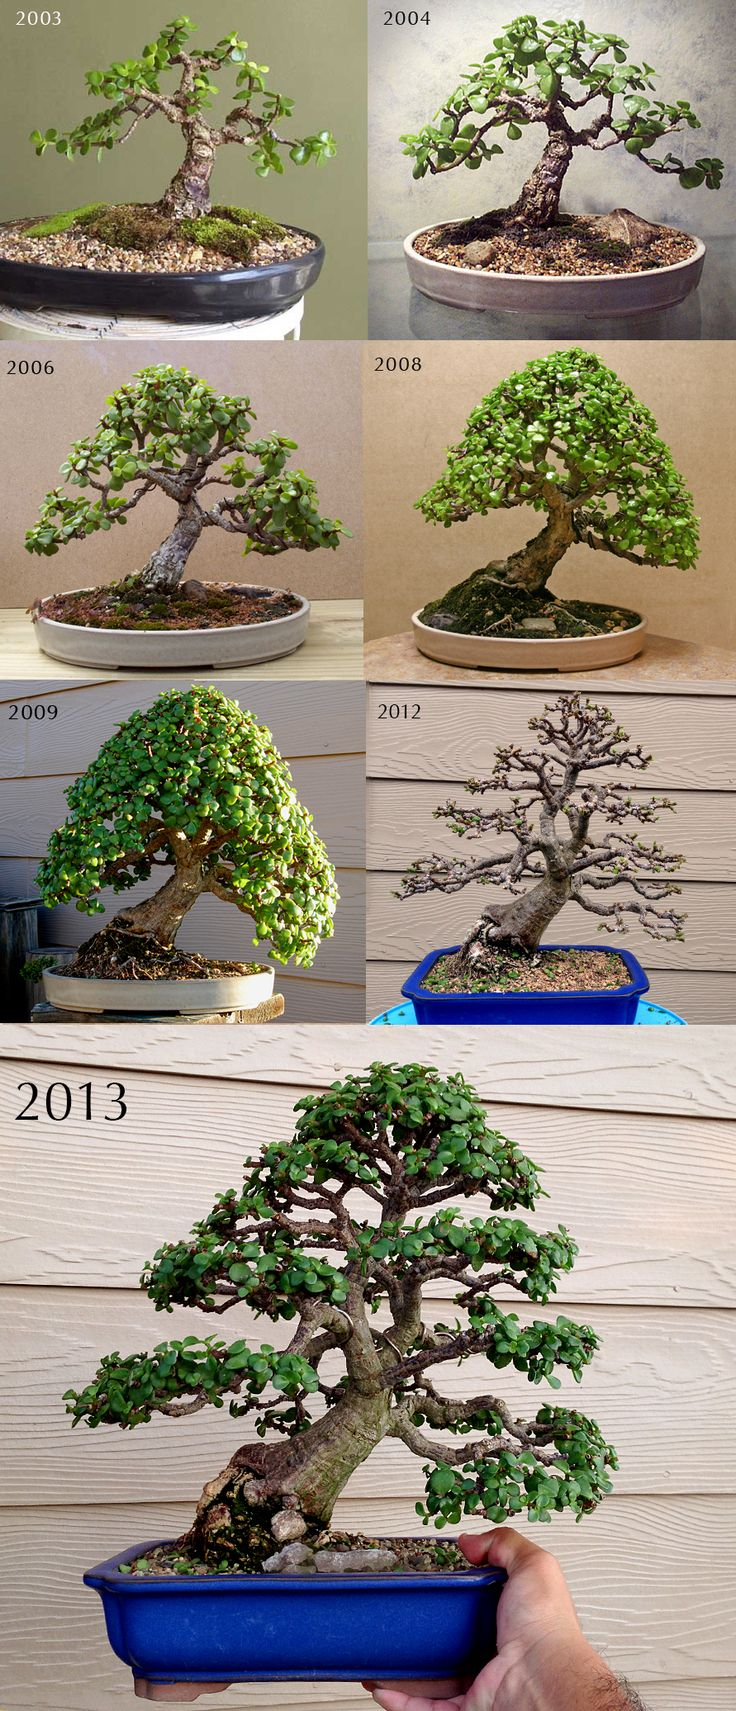 Portulacaria Afra aka Jade Bonsai, BONSAI TREES / BONSAI STYLES :  More At FOSTERGINGER @ Pinterest